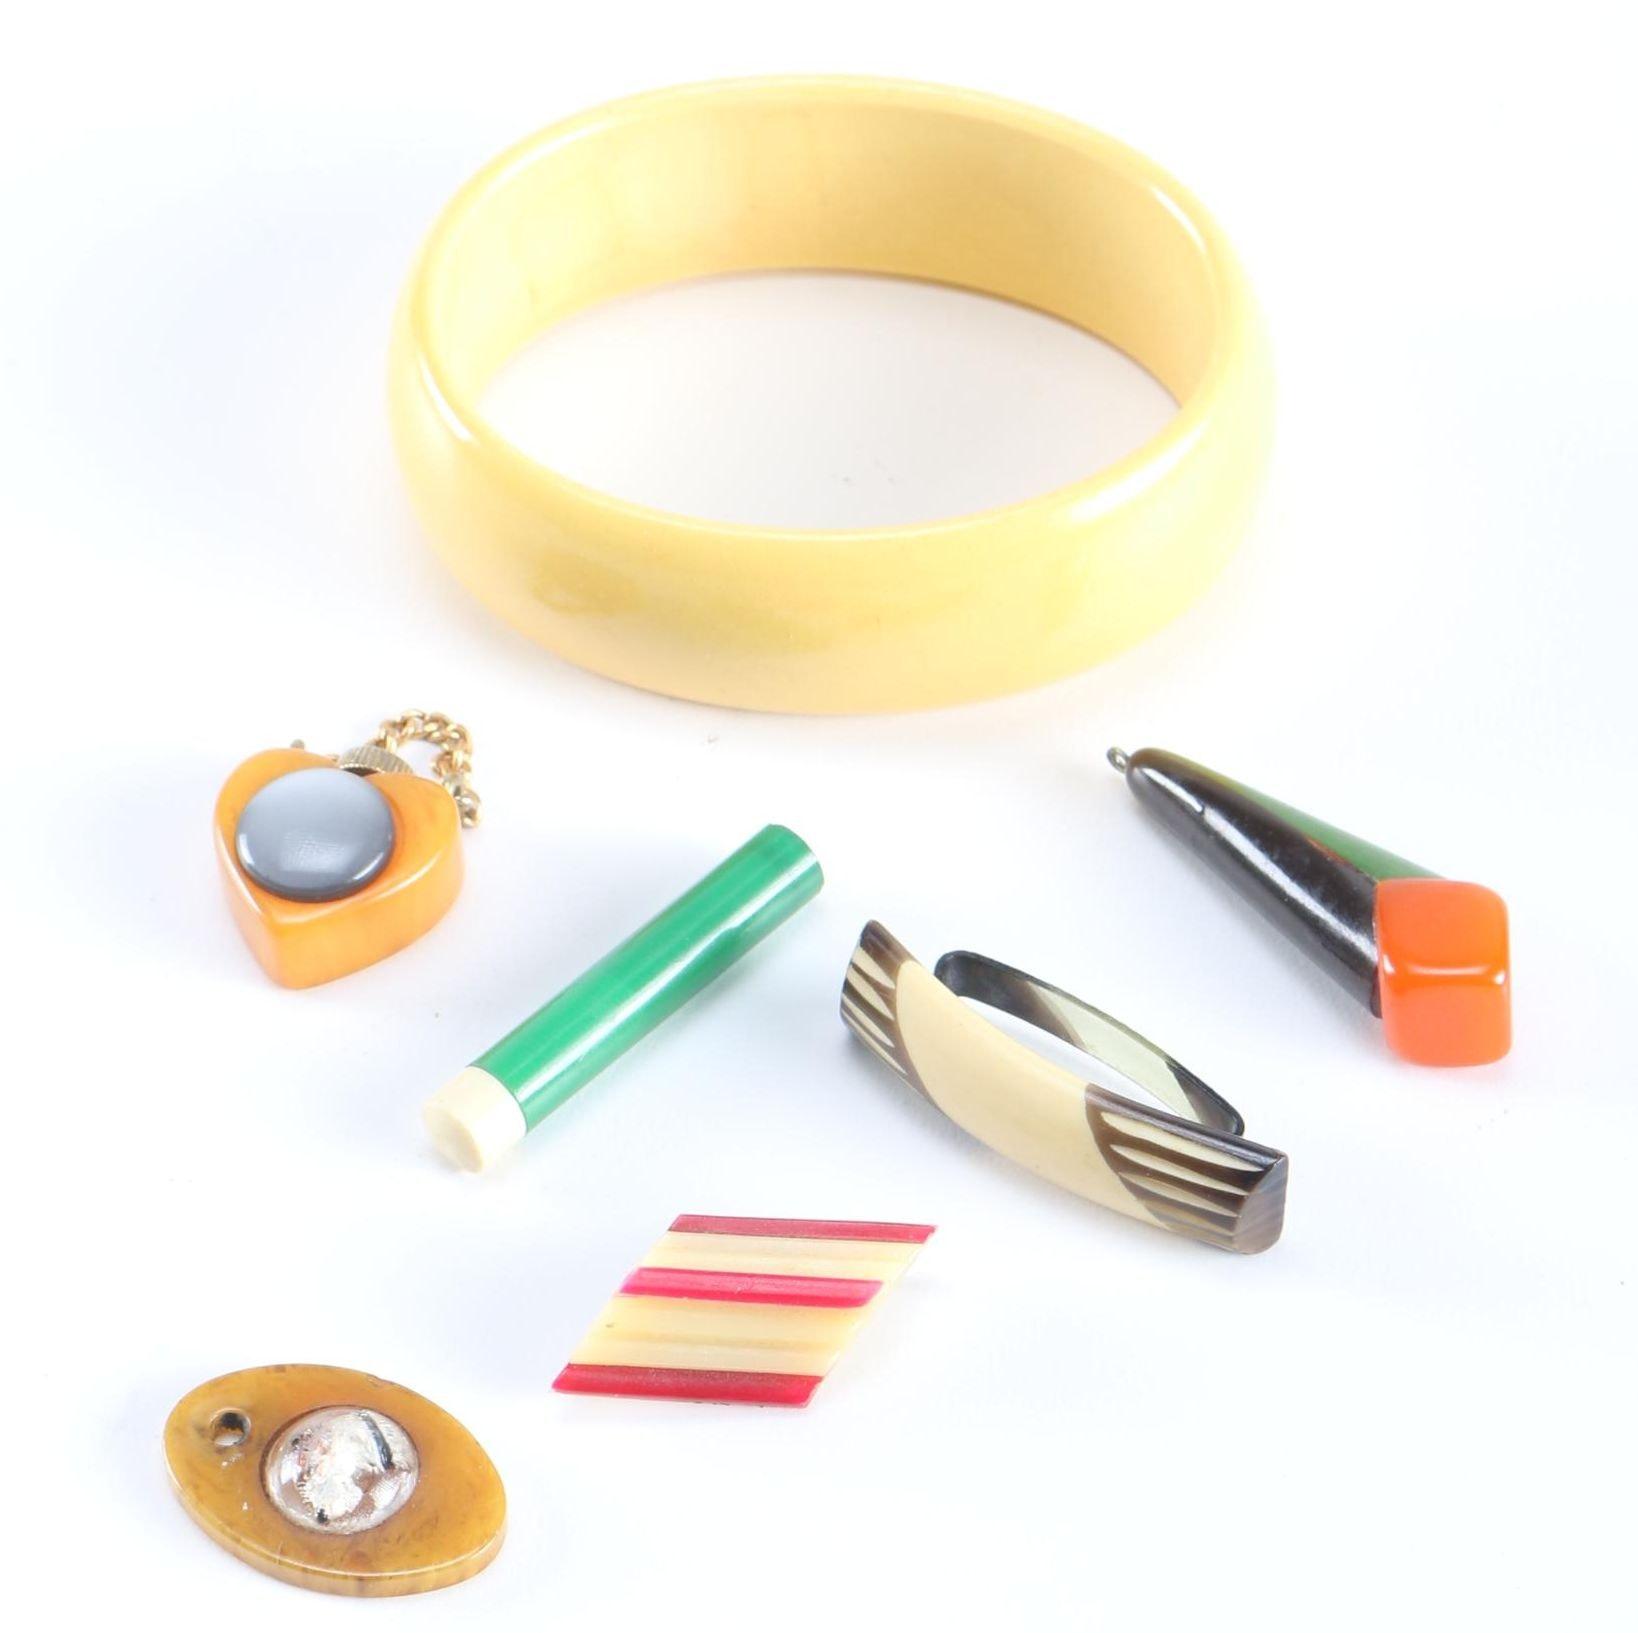 Bakelite Bracelet and Accessories